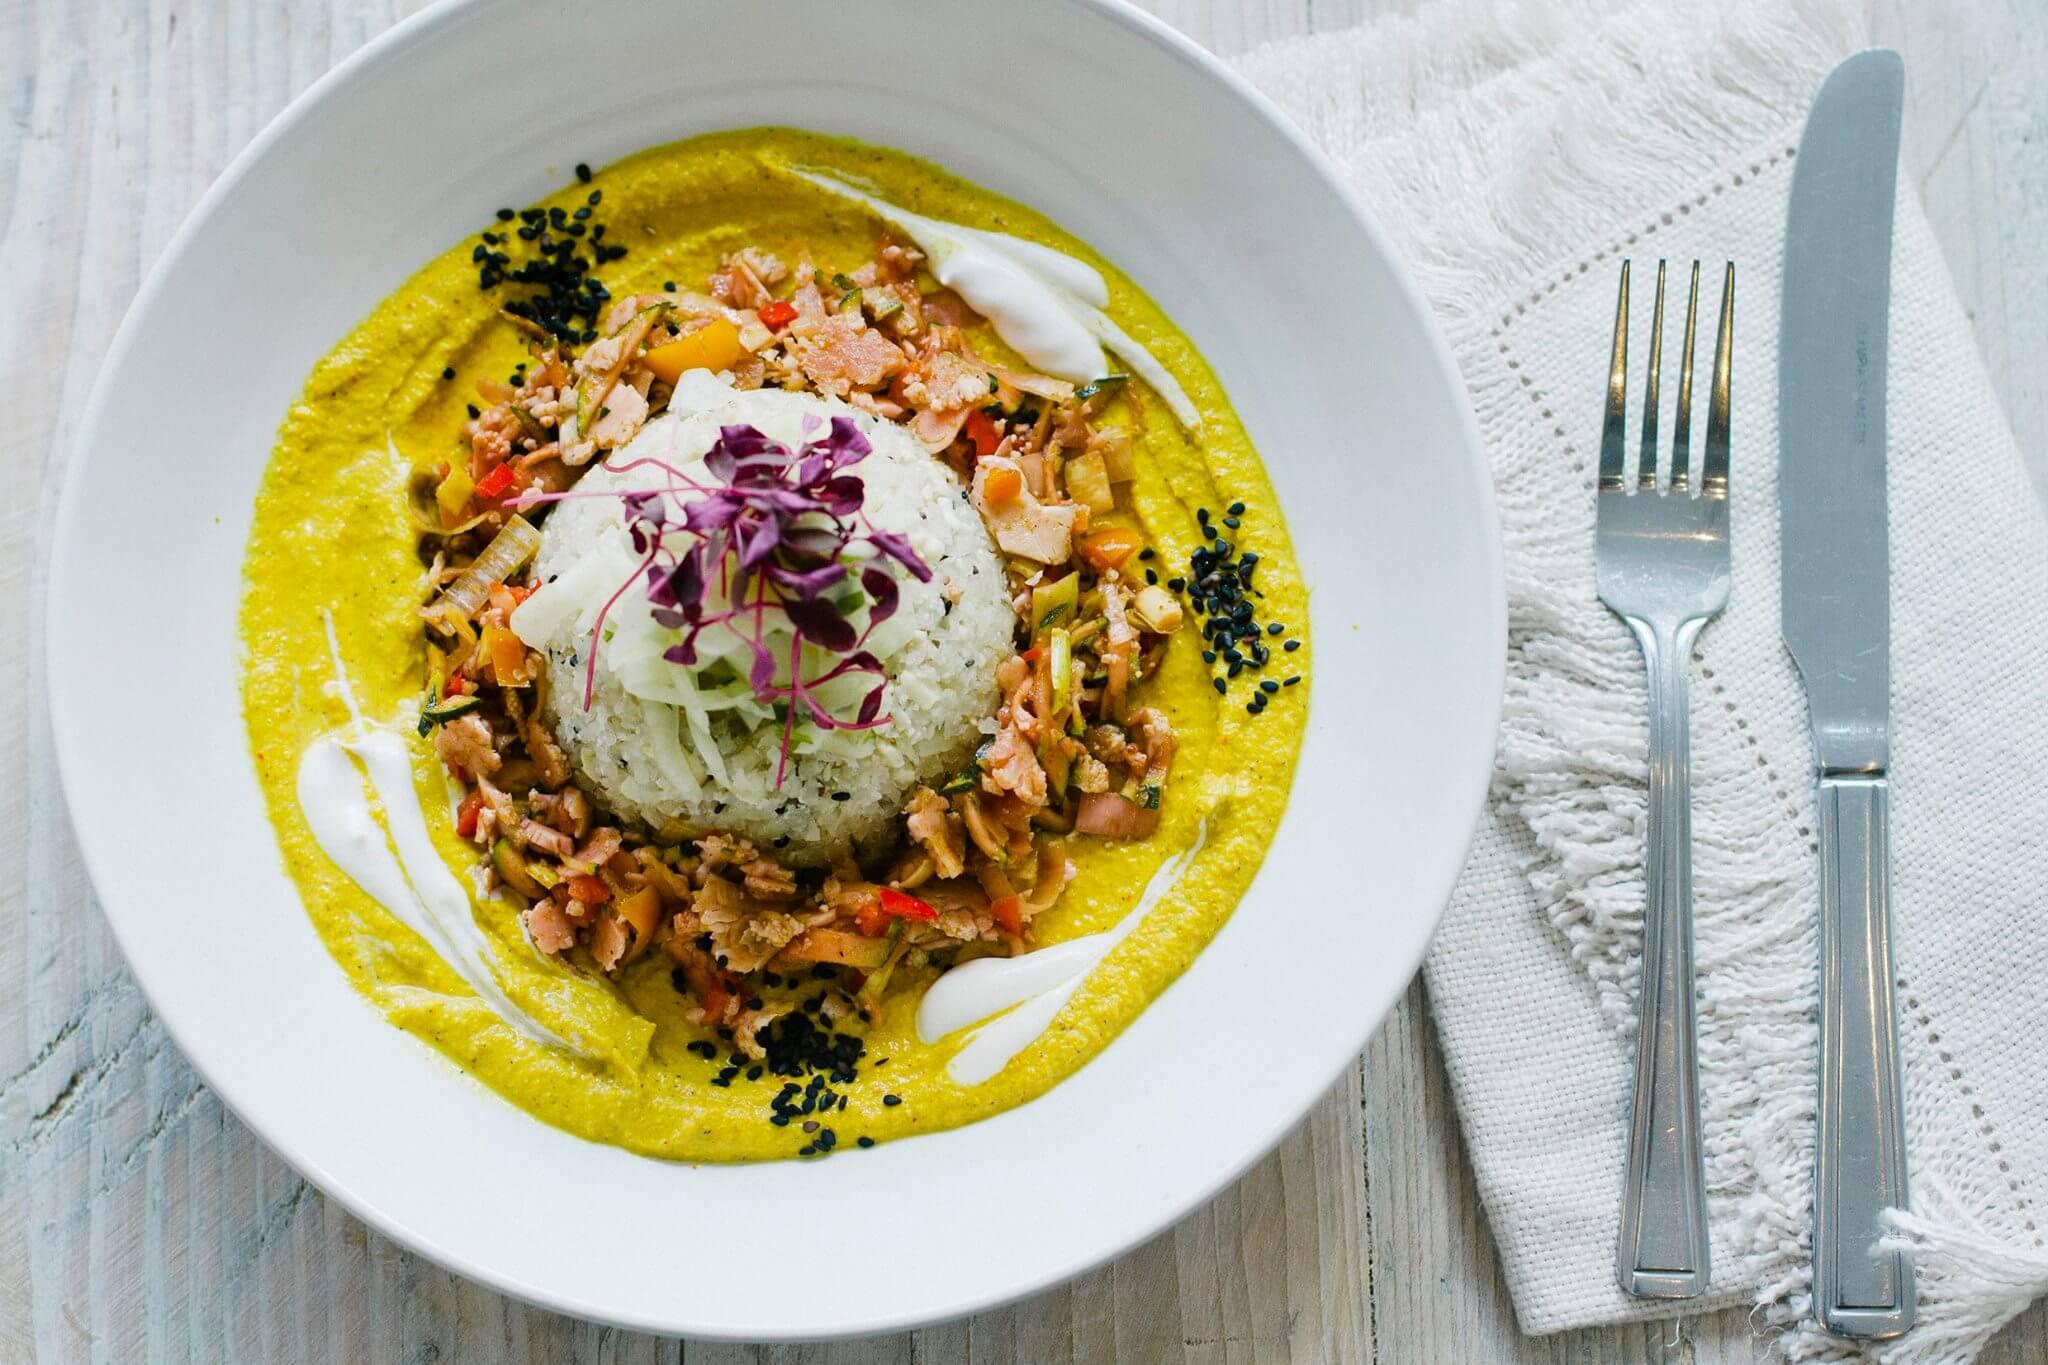 gourmet vegetarian restaurant - 1440×753